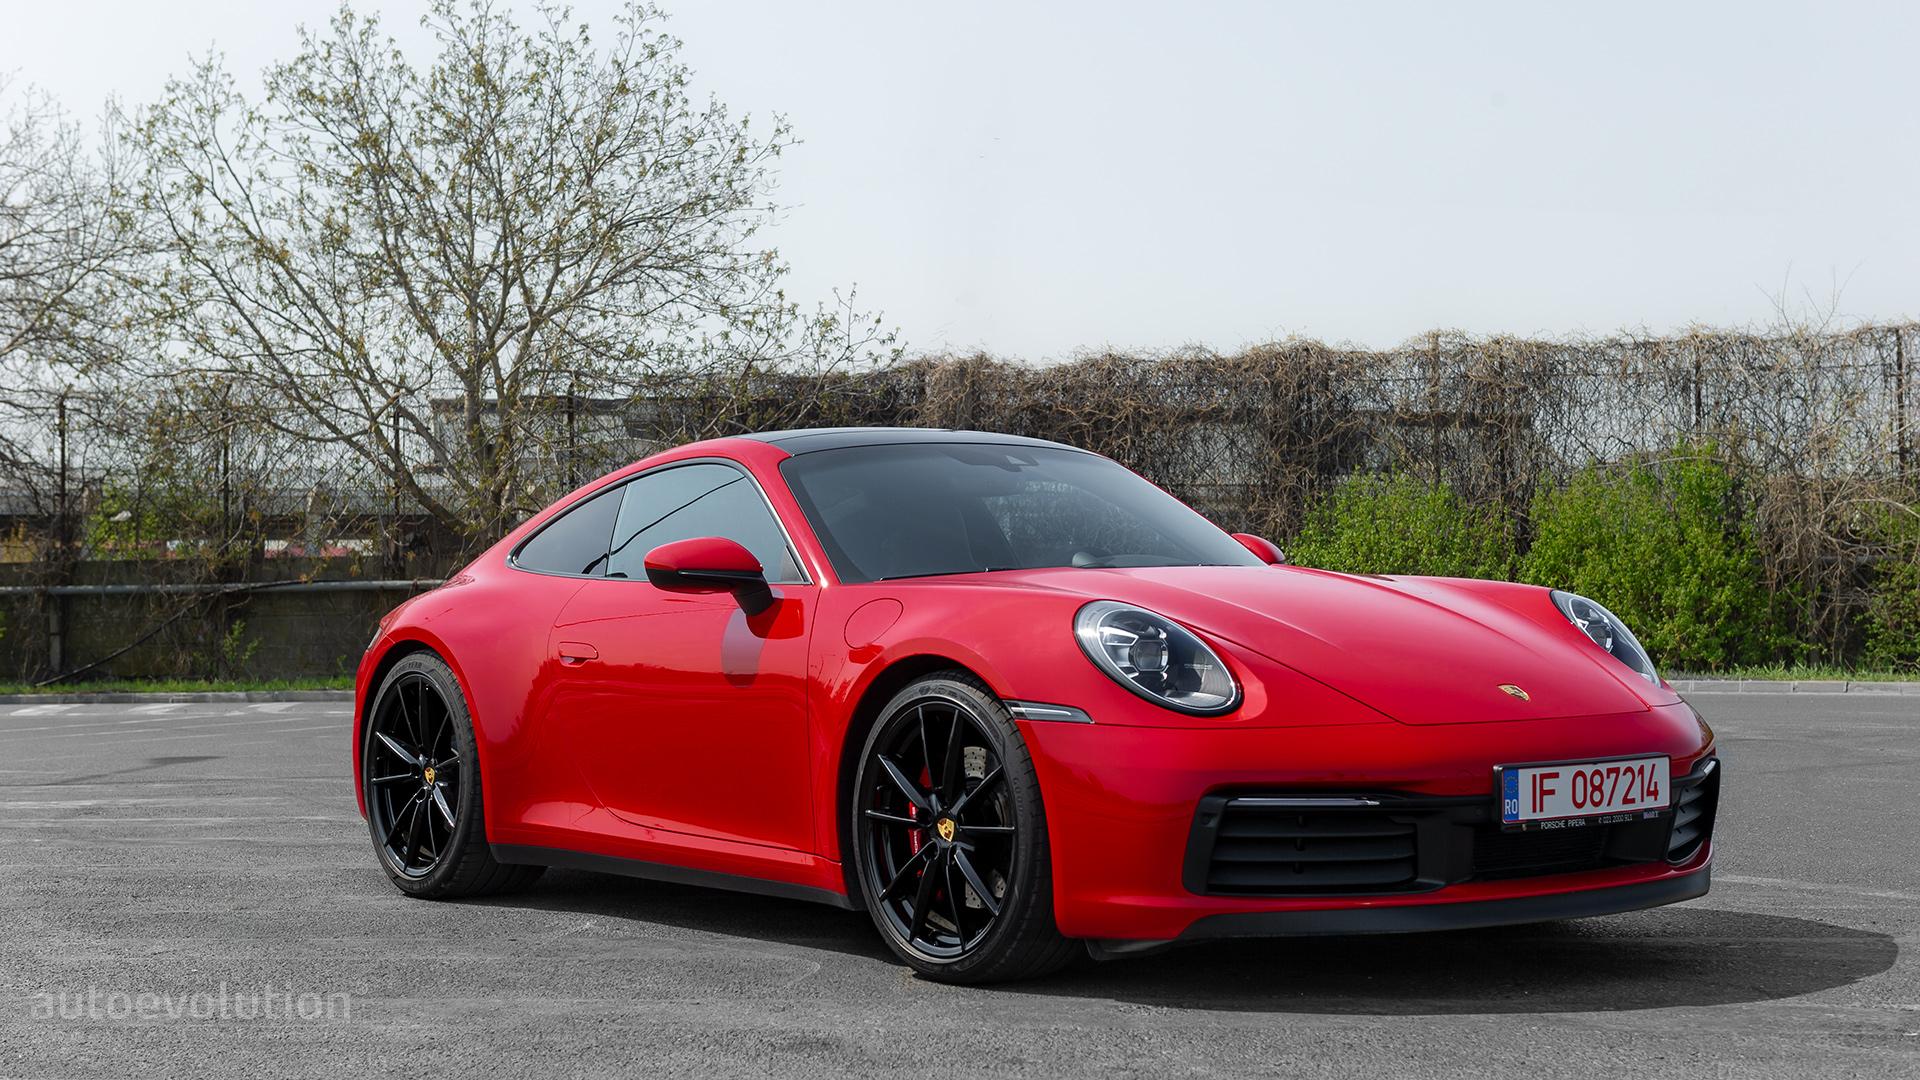 Porsche Carrera S >> 2020 Porsche 911 Carrera S Review Testdrive Autoevolution